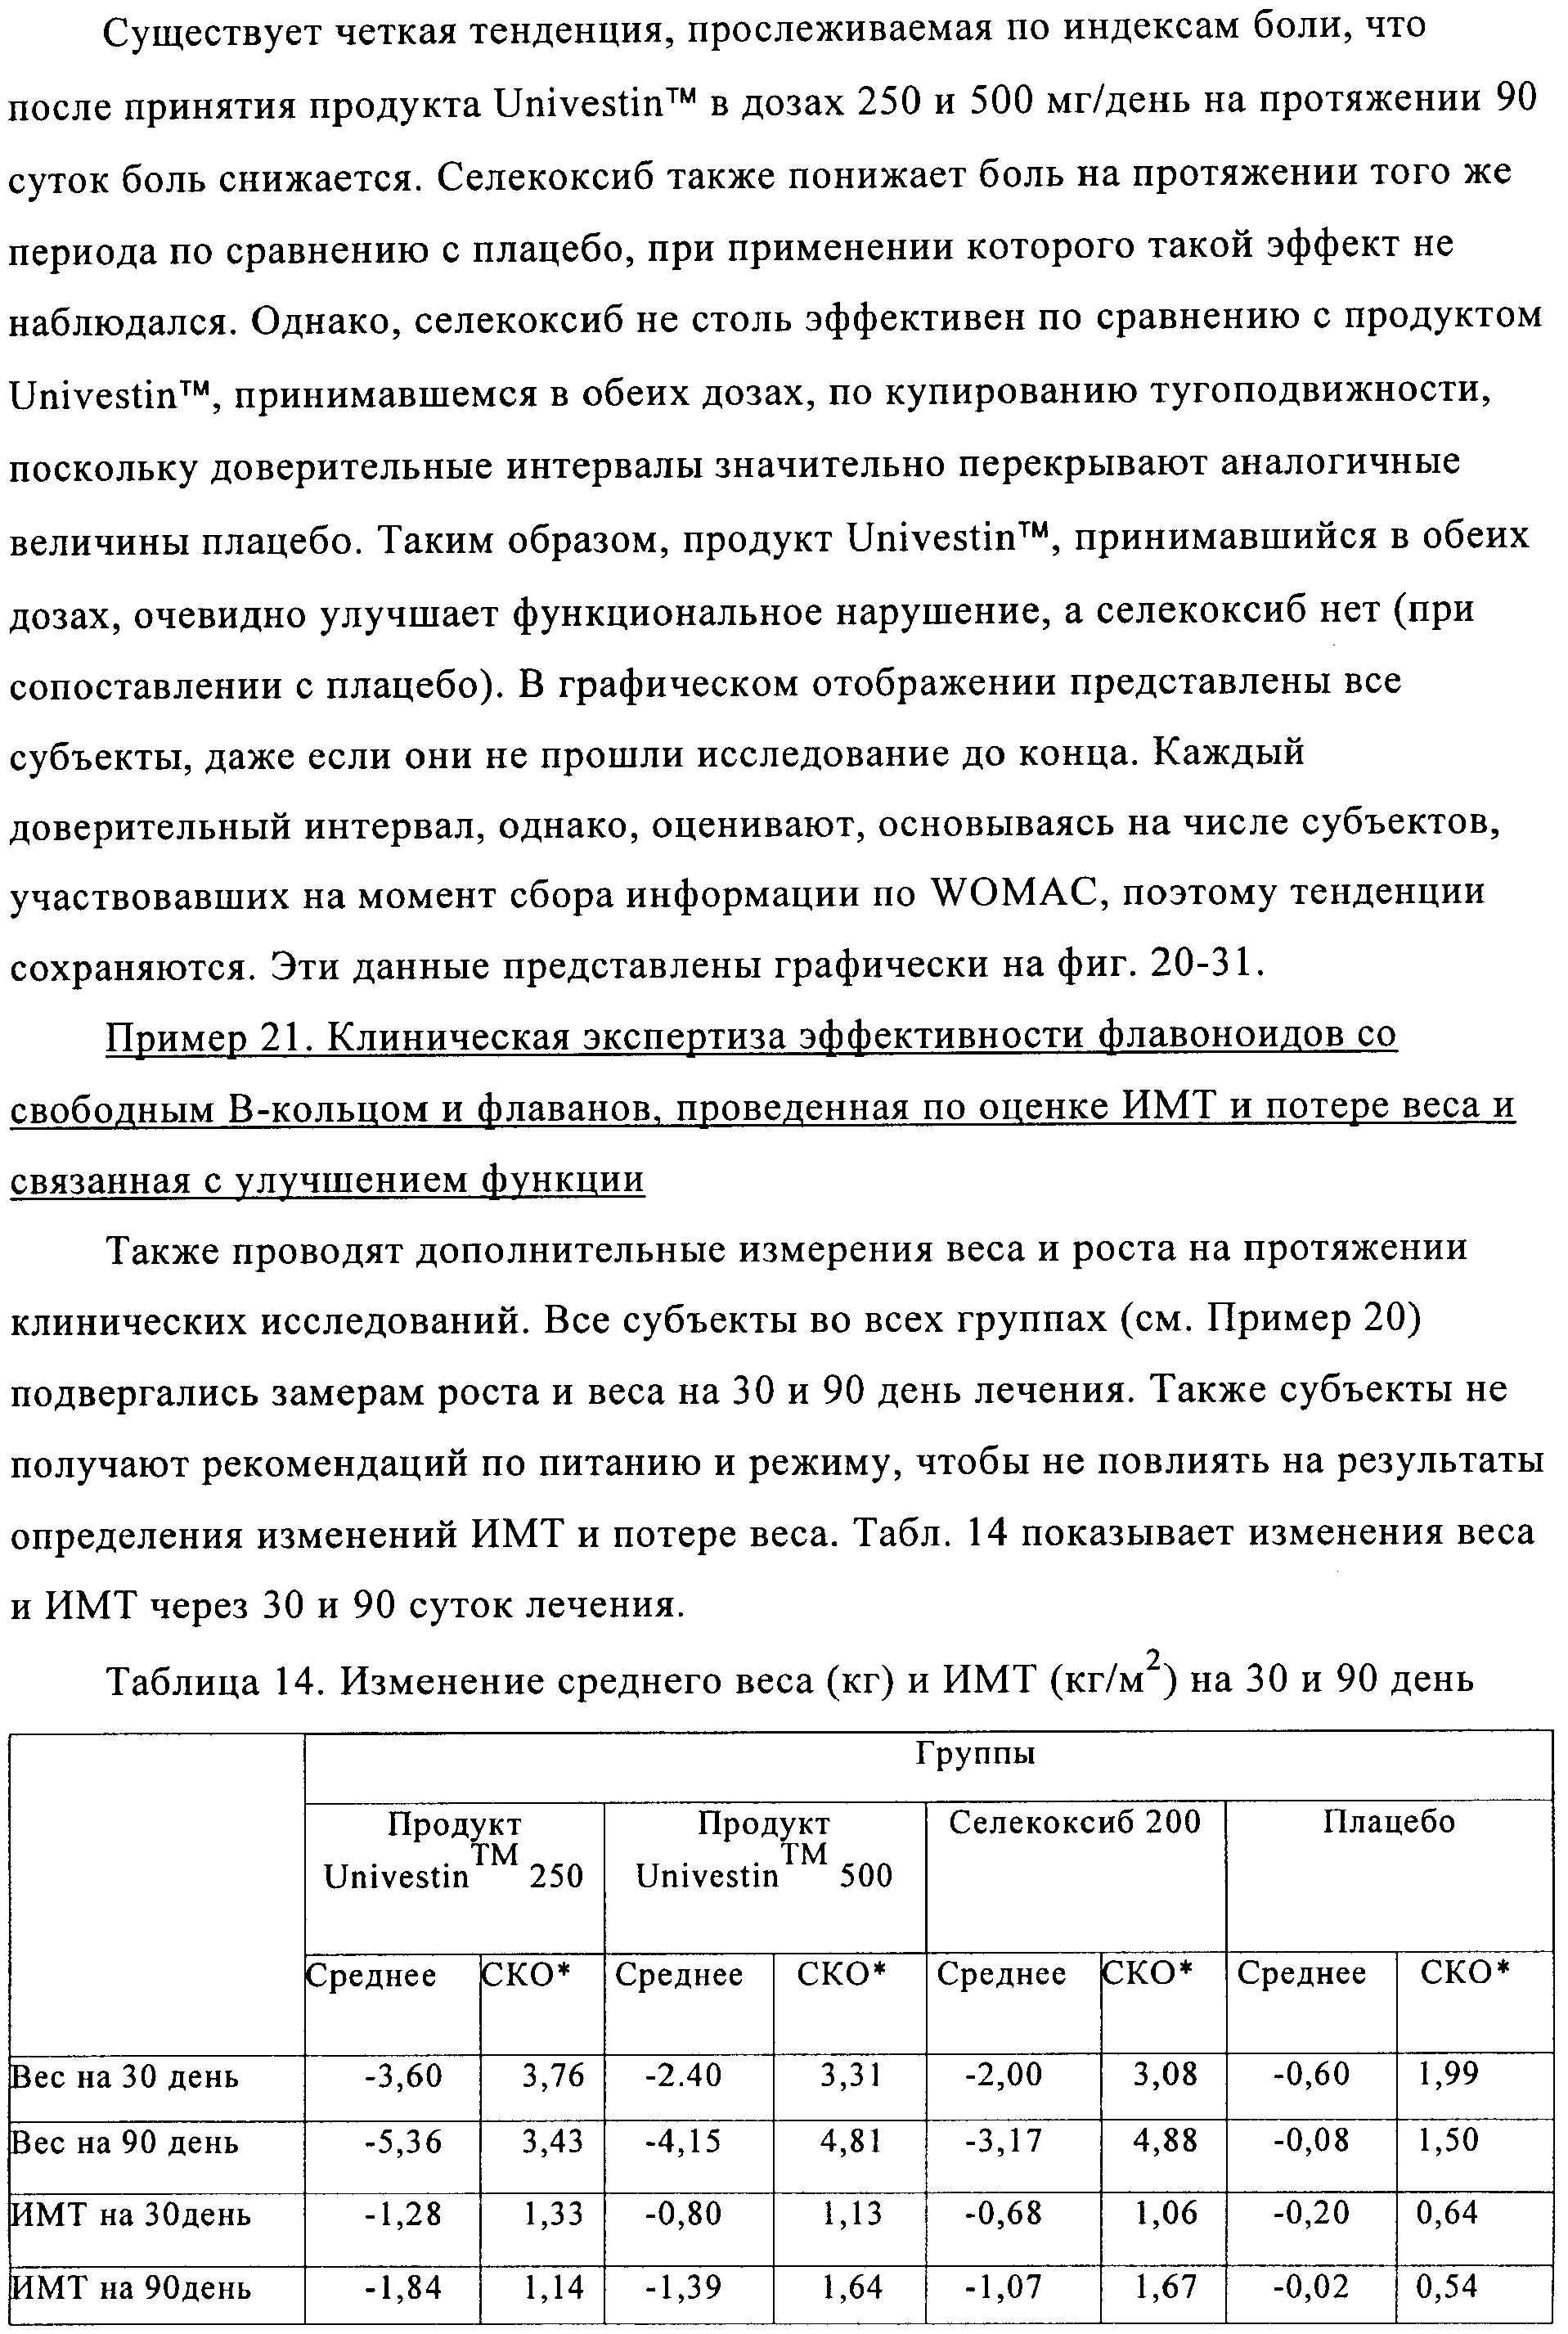 Figure 00000074